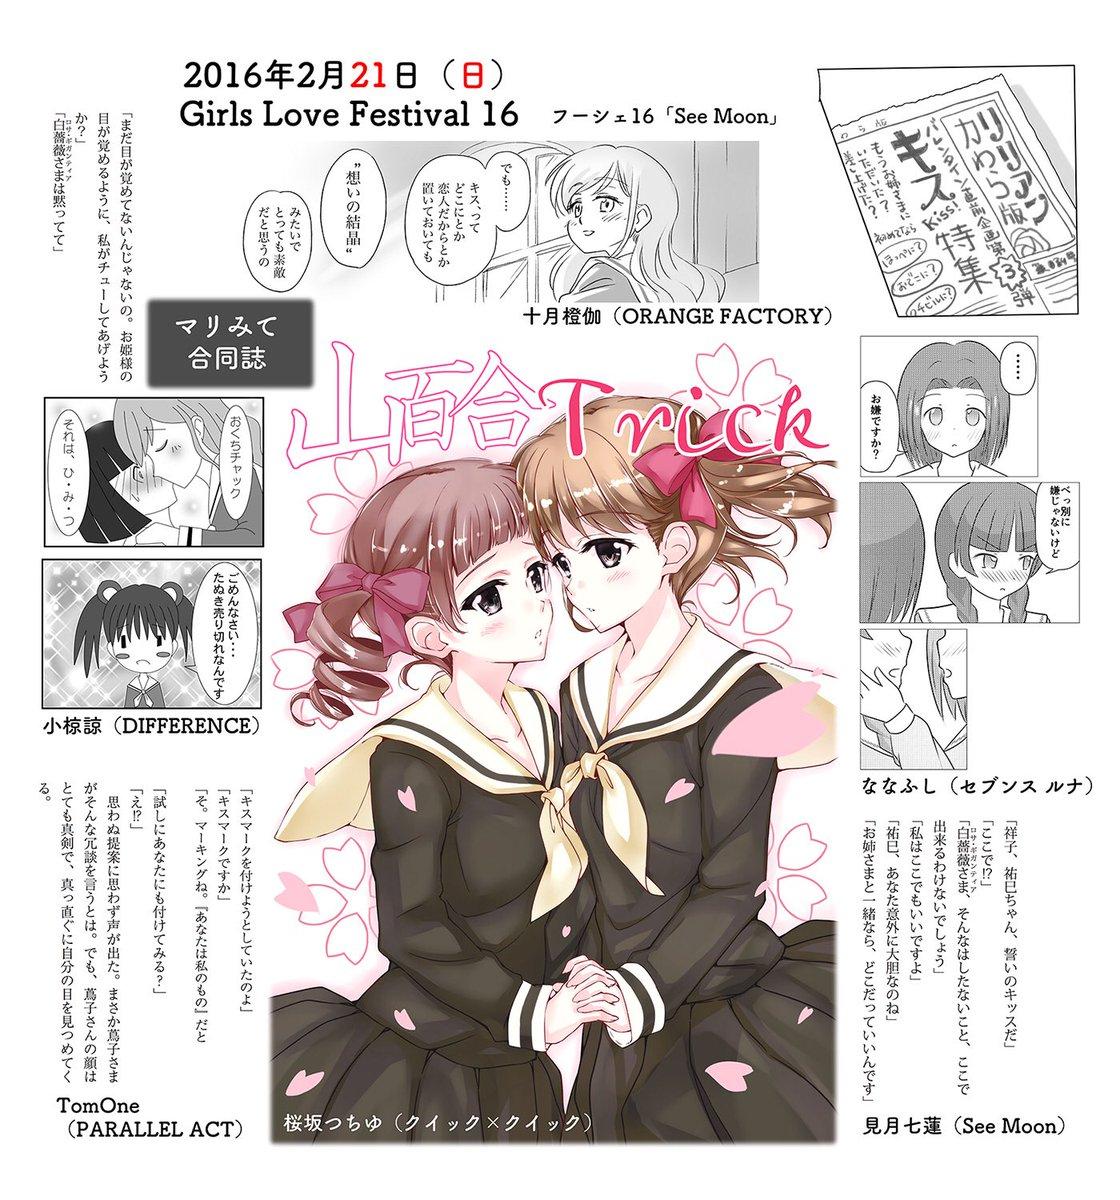 Girls Love Festival 16で頒布する、マリみて合同本のサンプルです! https://t.co/3wE32LVseA